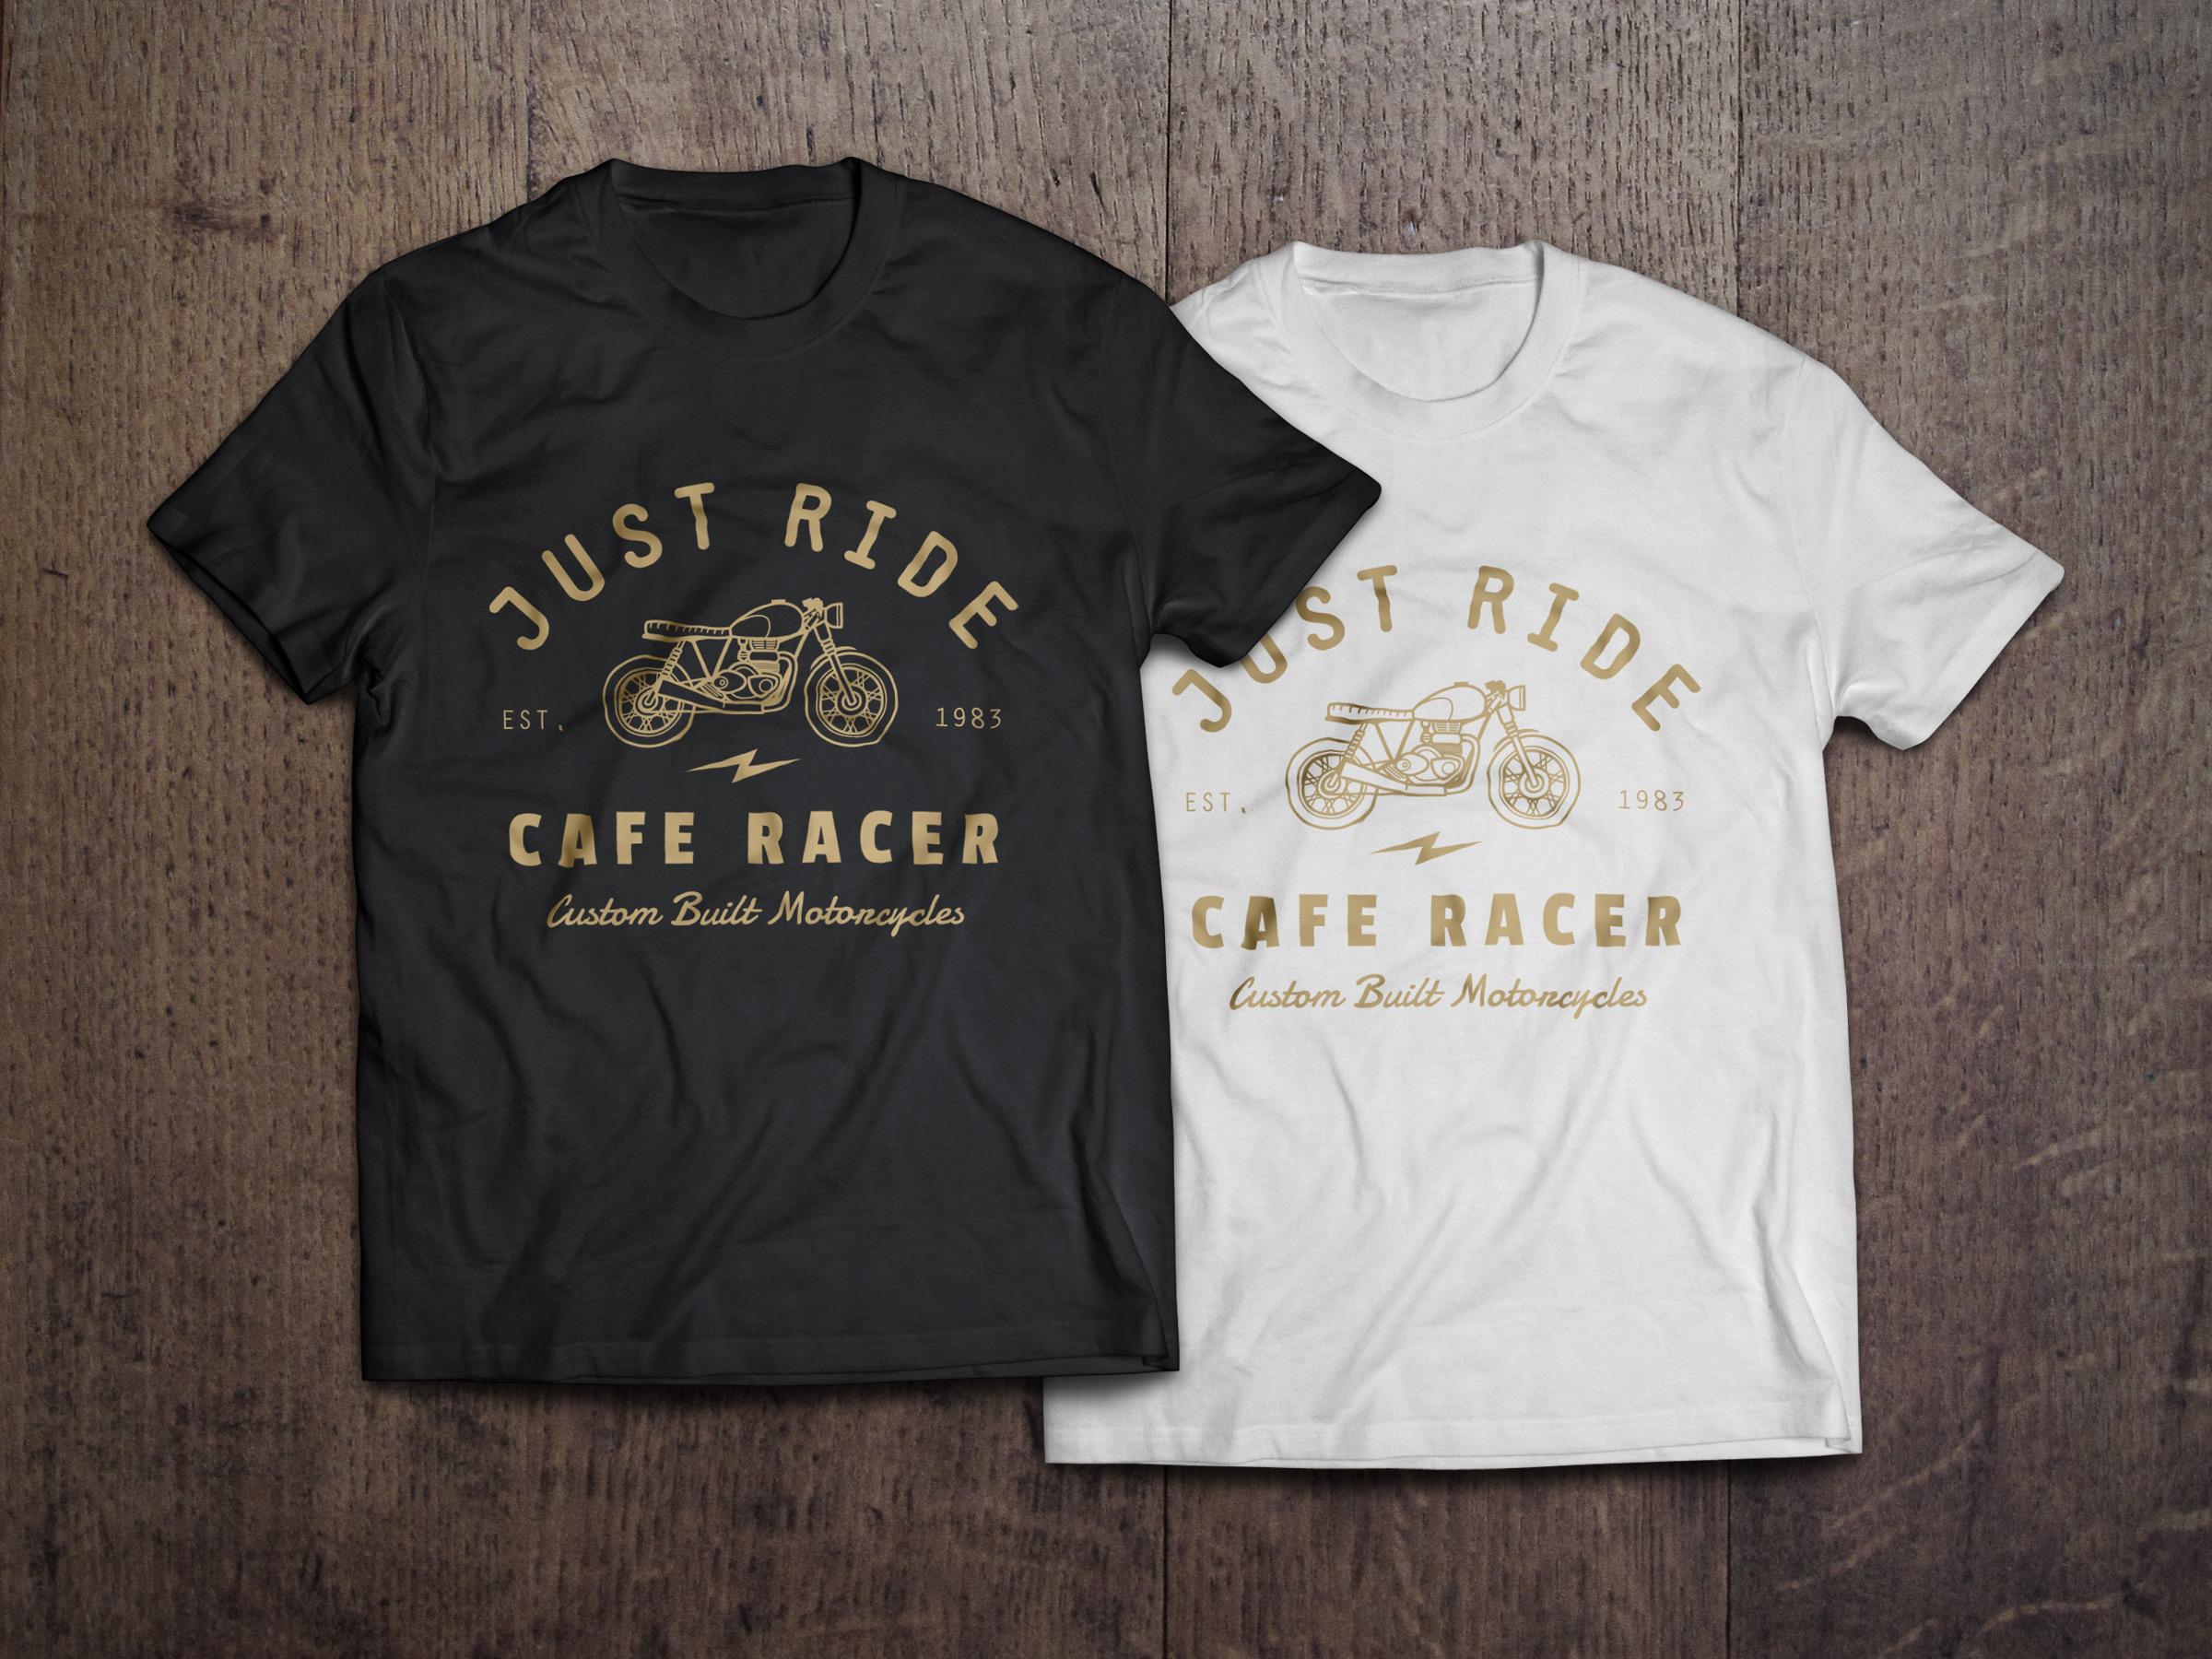 15 T- Shirt Mockup PSD Images